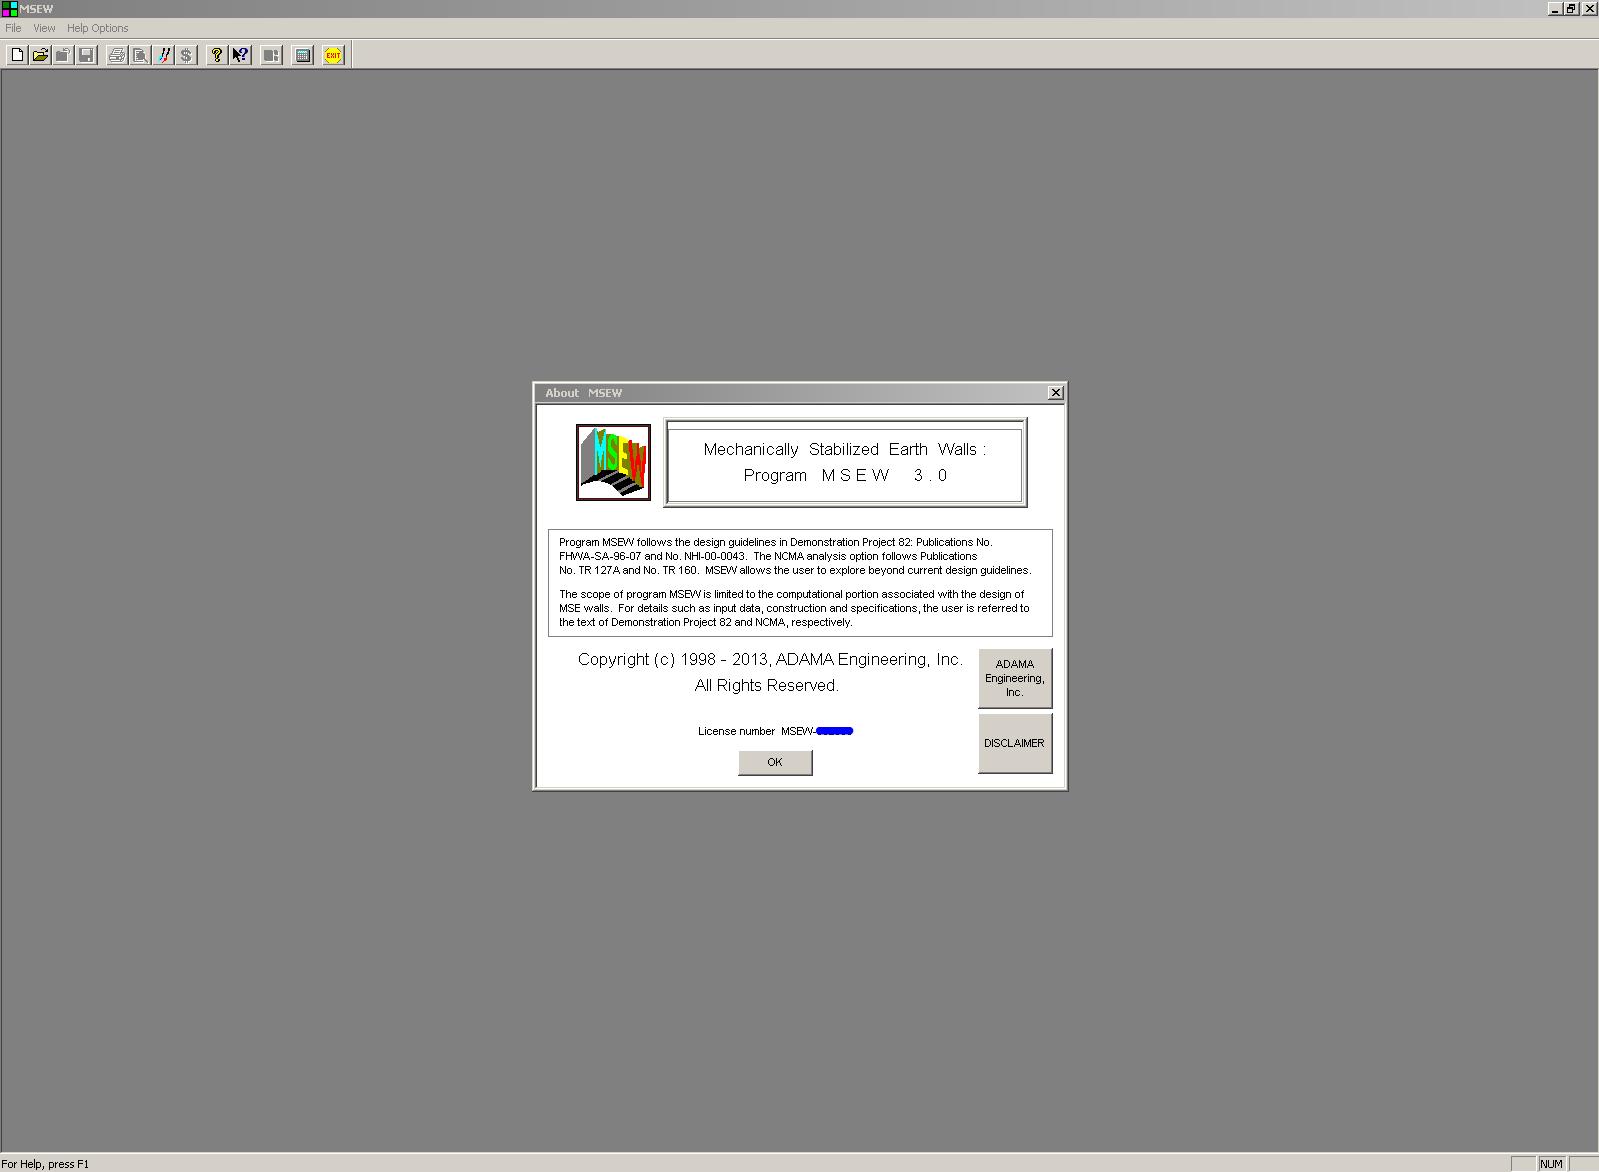 MSEW 3 0 ADAMA Engineering ( Hasp SRM Dongle ) - Software Retail Seller